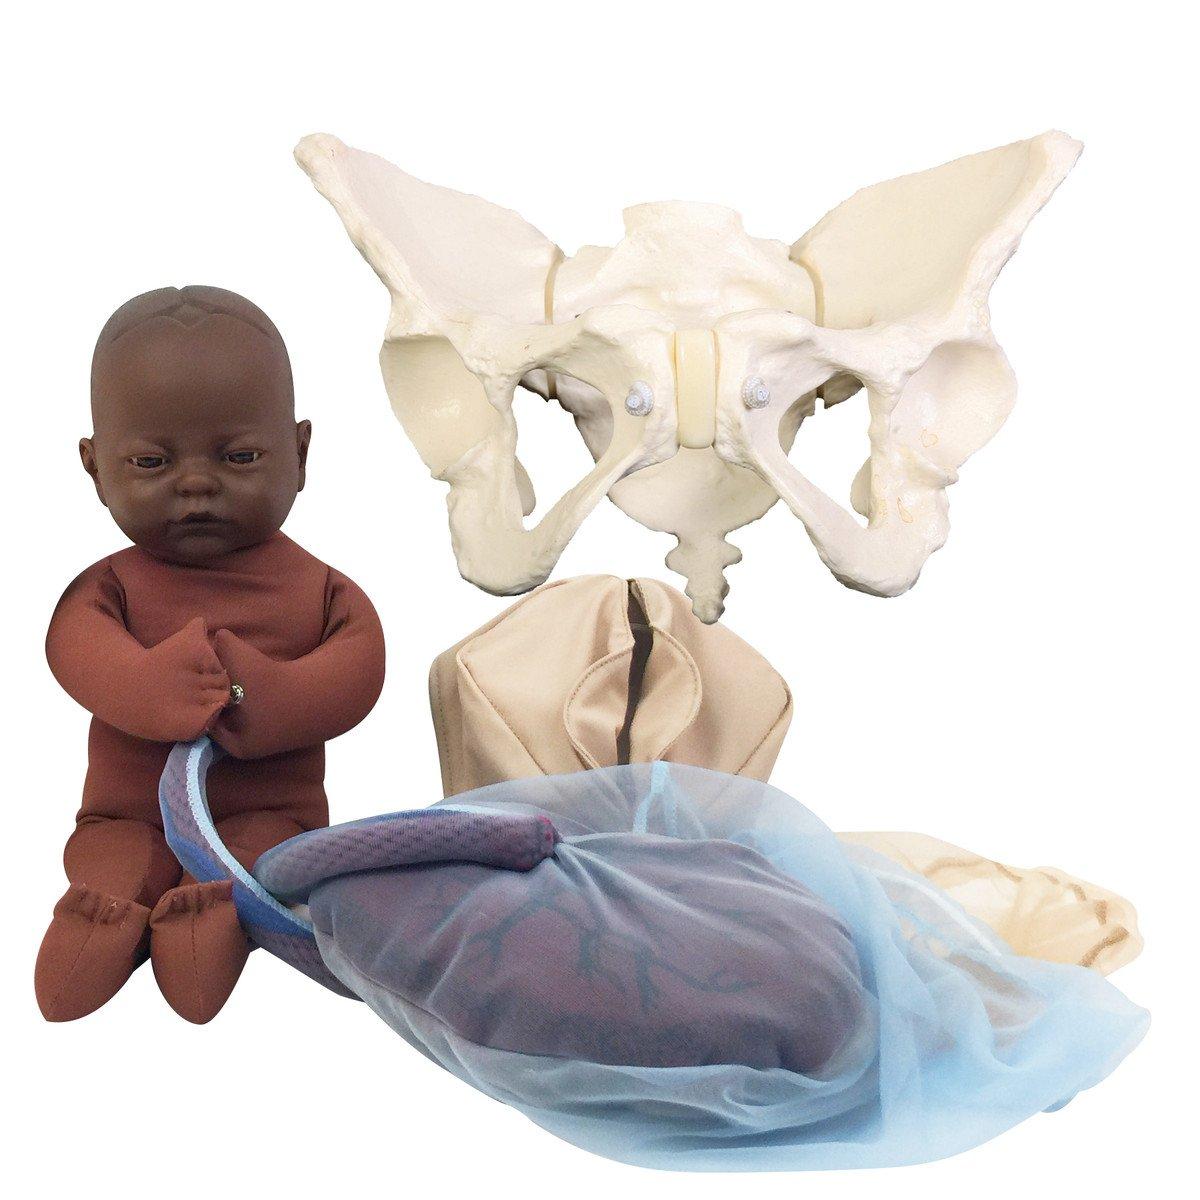 childbirth graphics pelvis model set